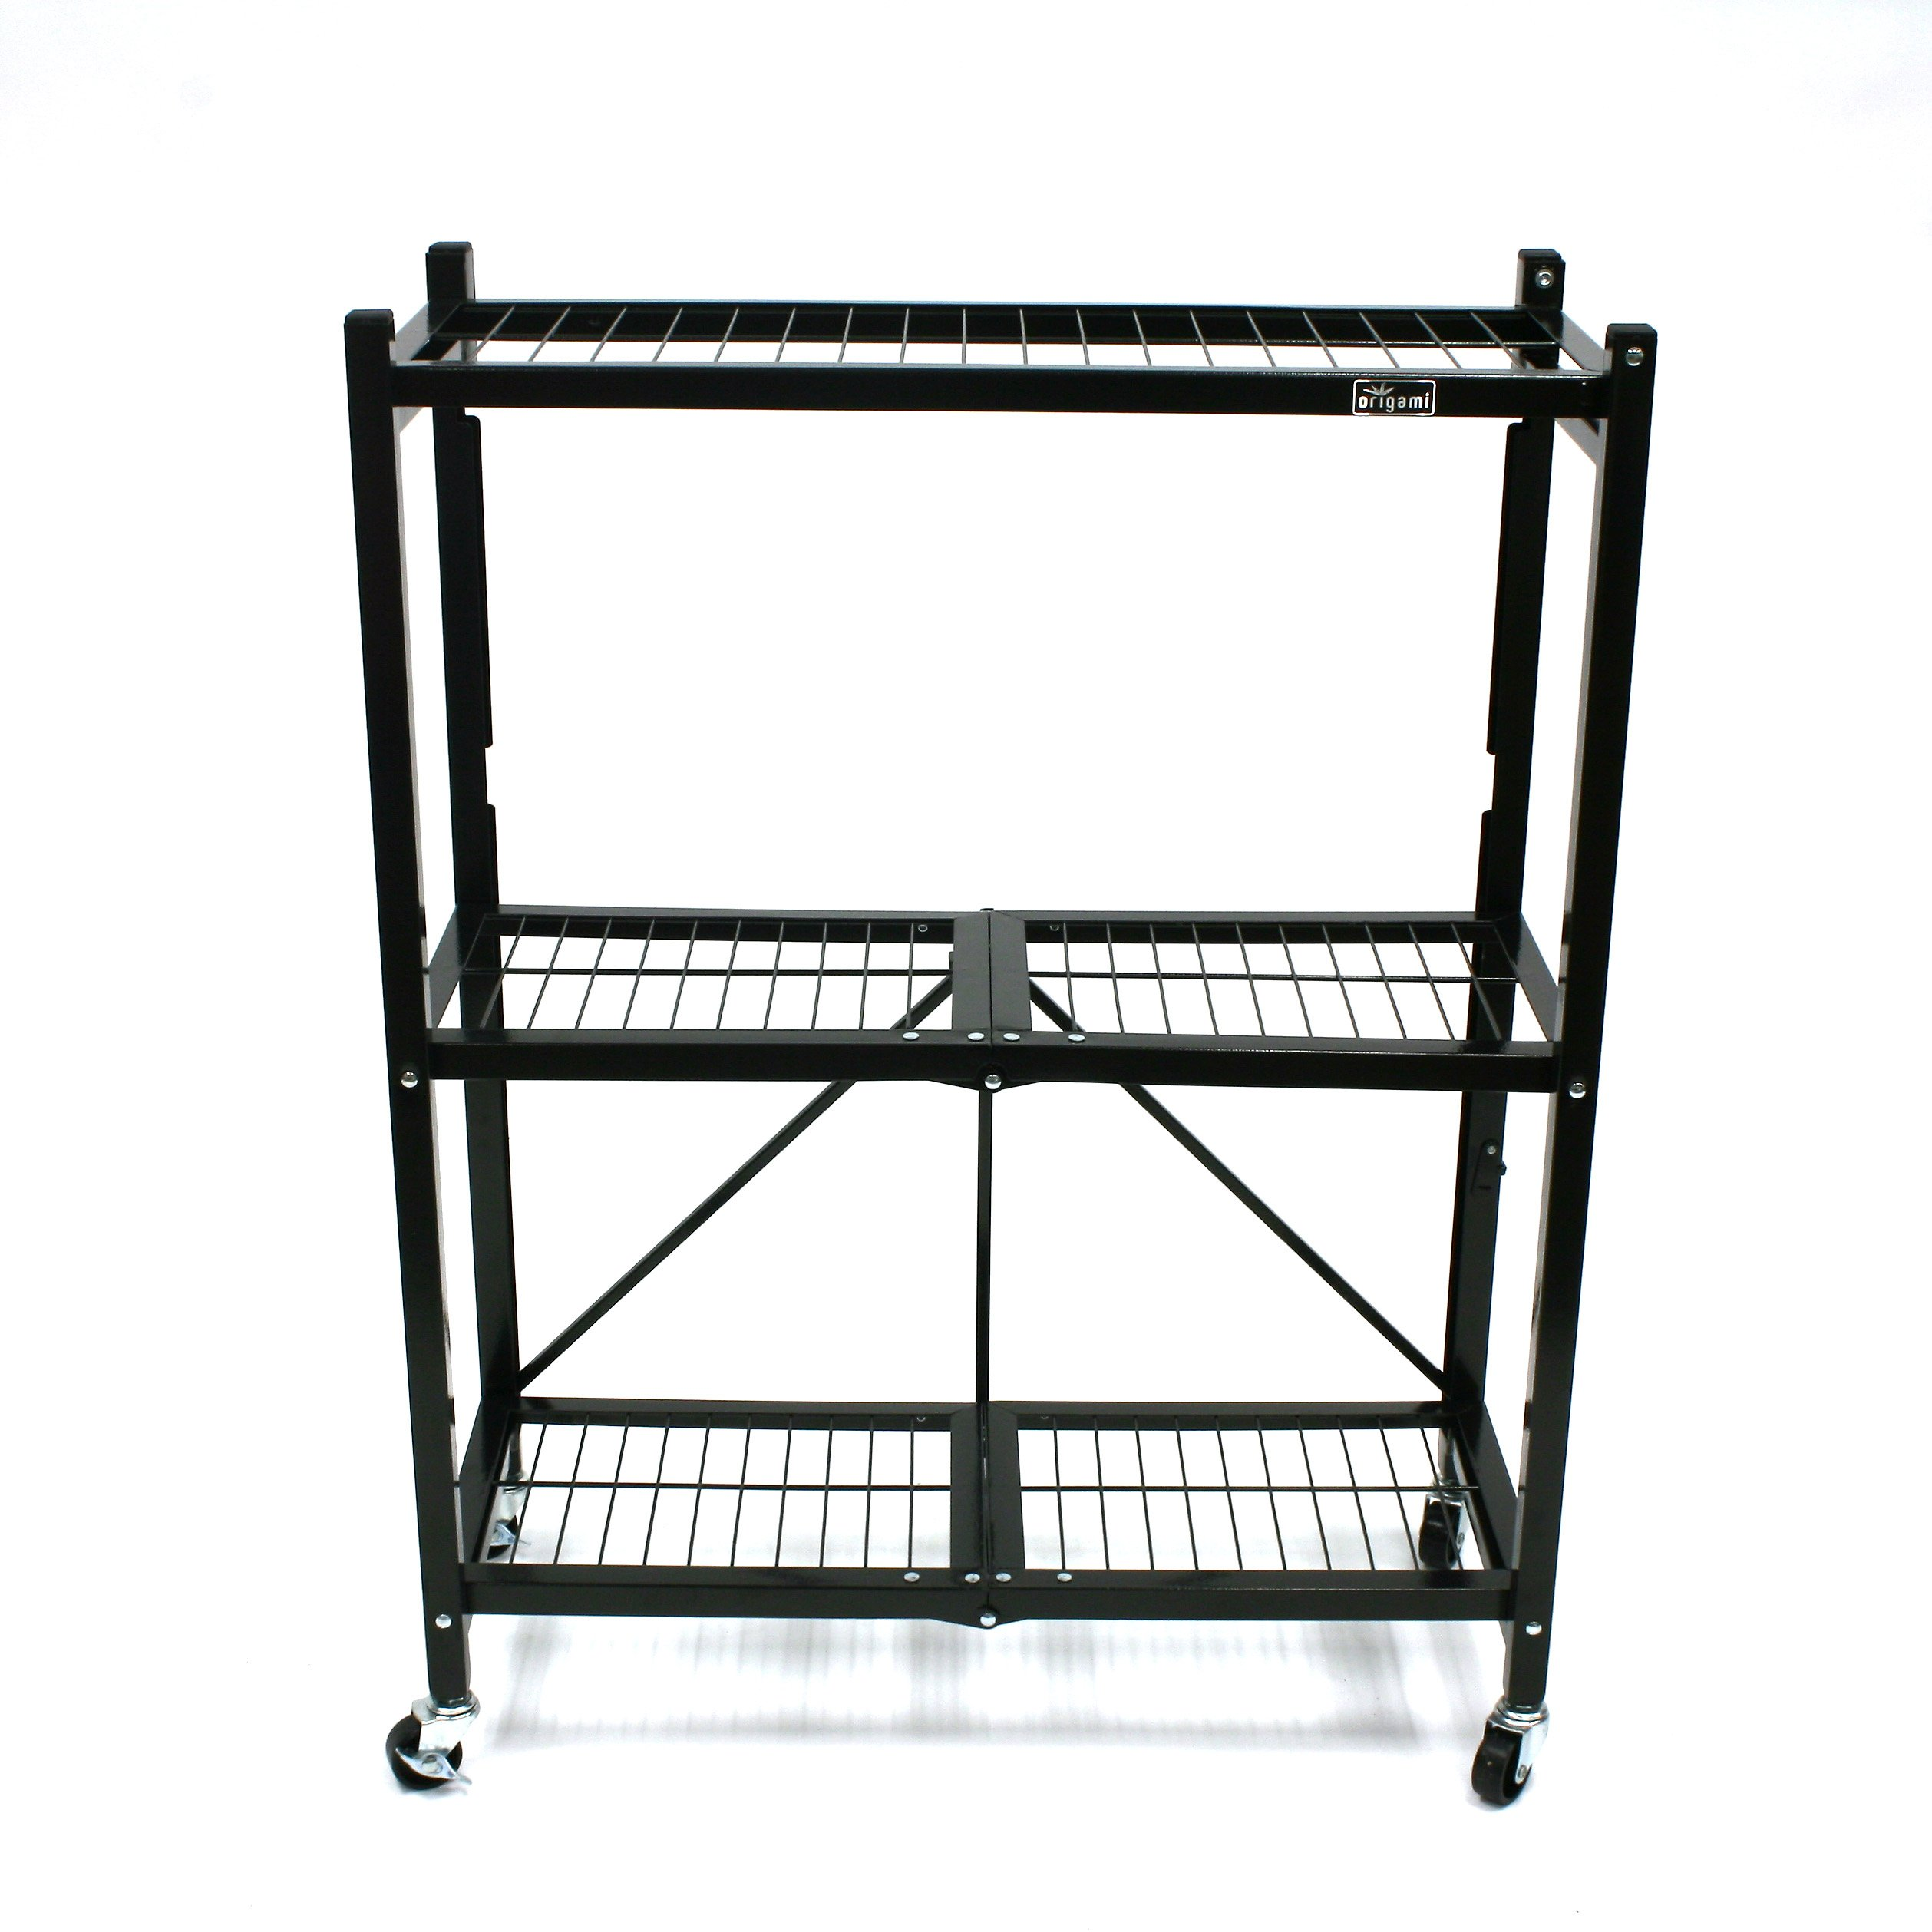 Origami R32-06W Shelf with 2-Inch Wheel, Black, 2-Pack